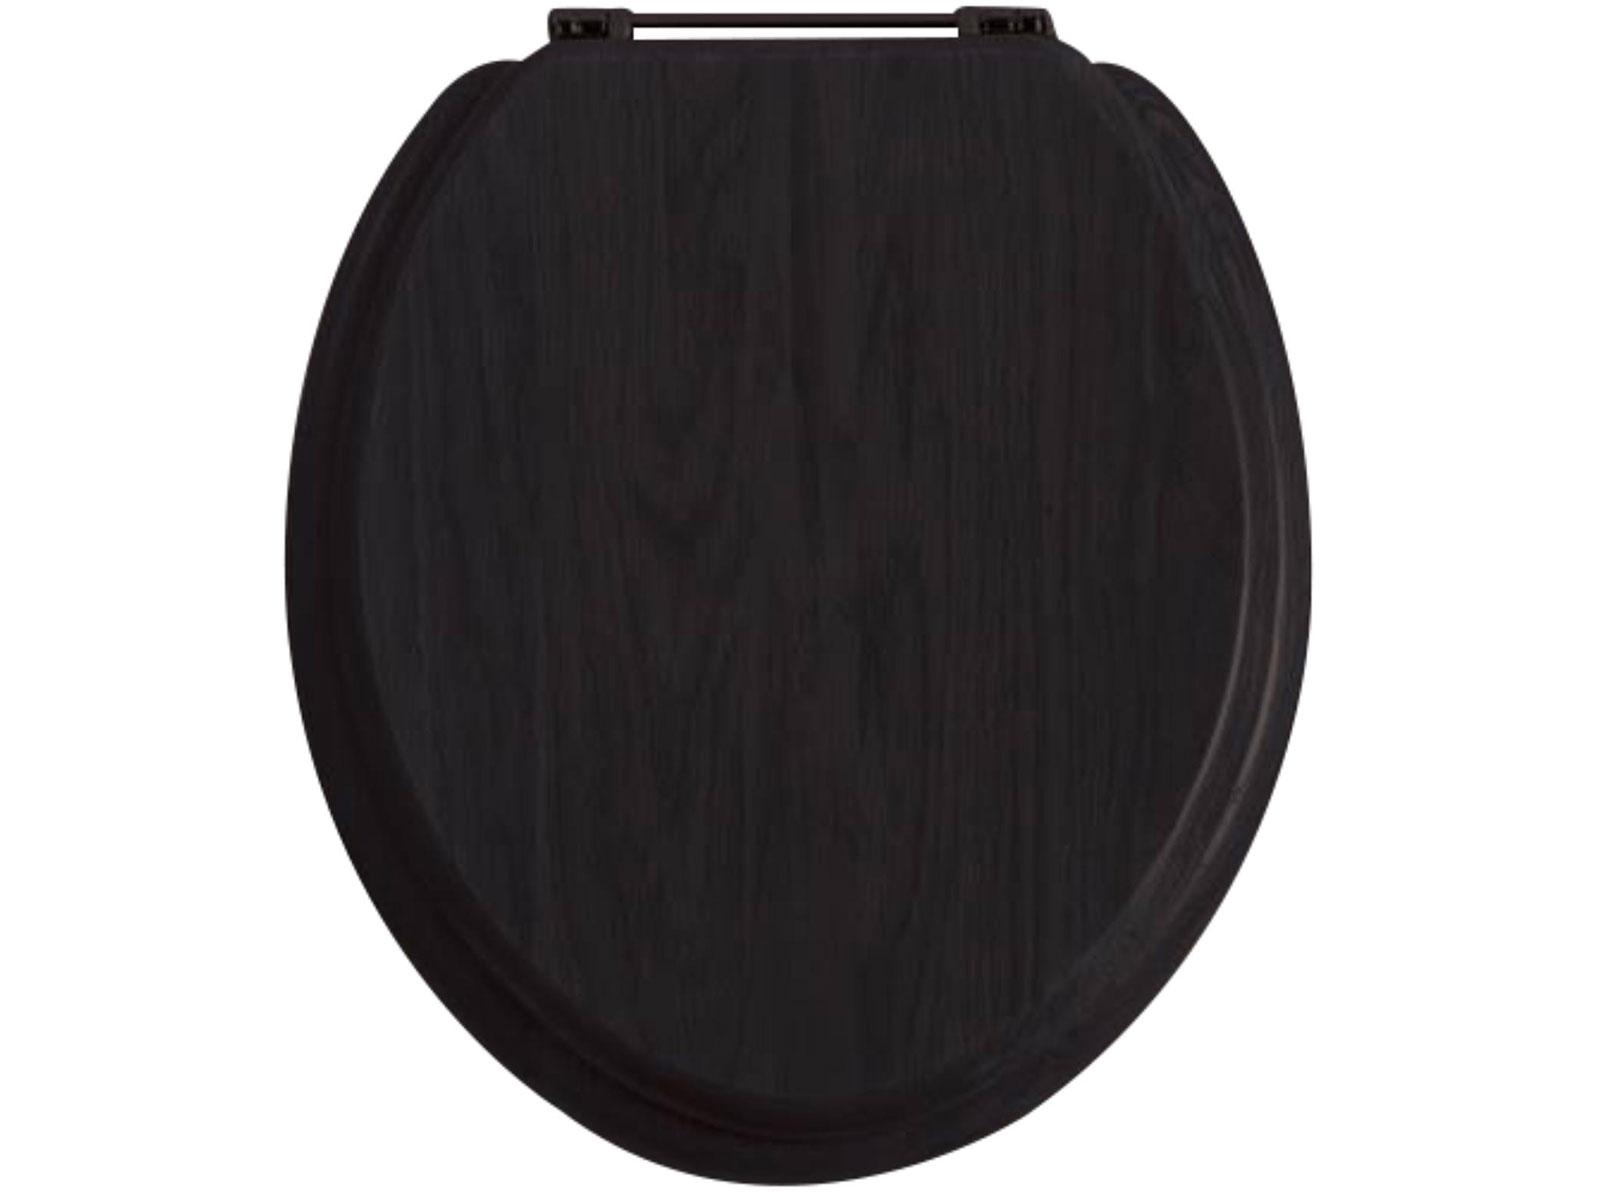 Black Toilet Seat With Chrome Standard Hinge WC Seat Wooden - Black wooden toilet seat